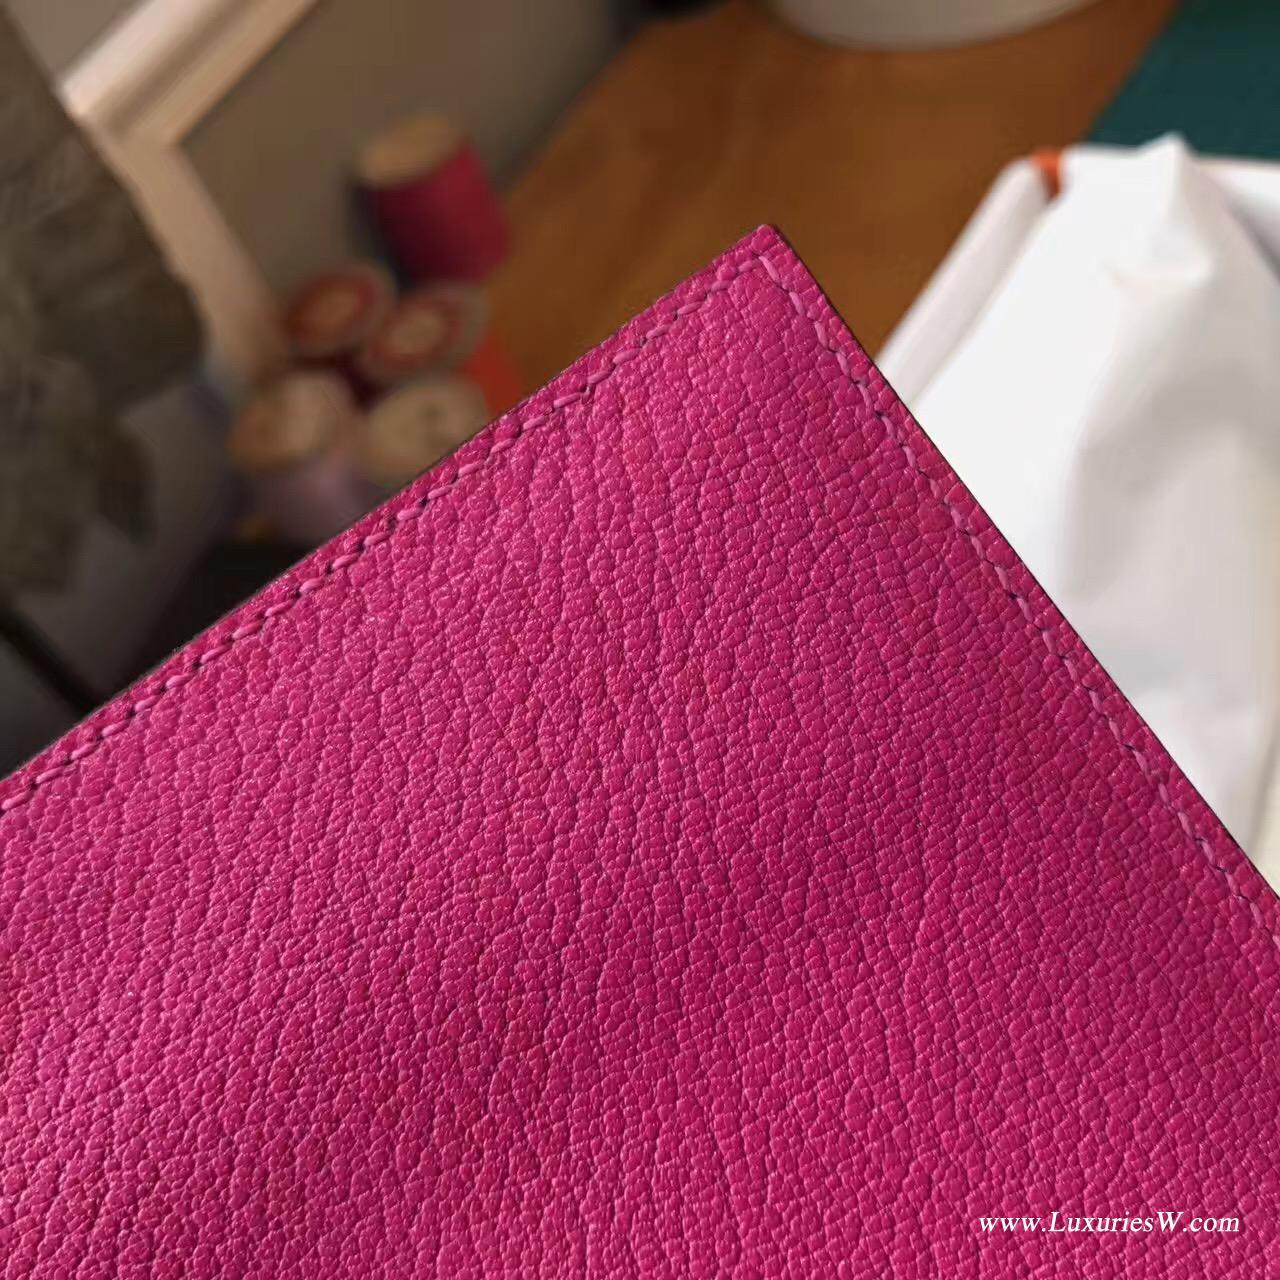 Herems Verrou Chaine bag 手包最新款手包 E5糖果粉色 銀扣